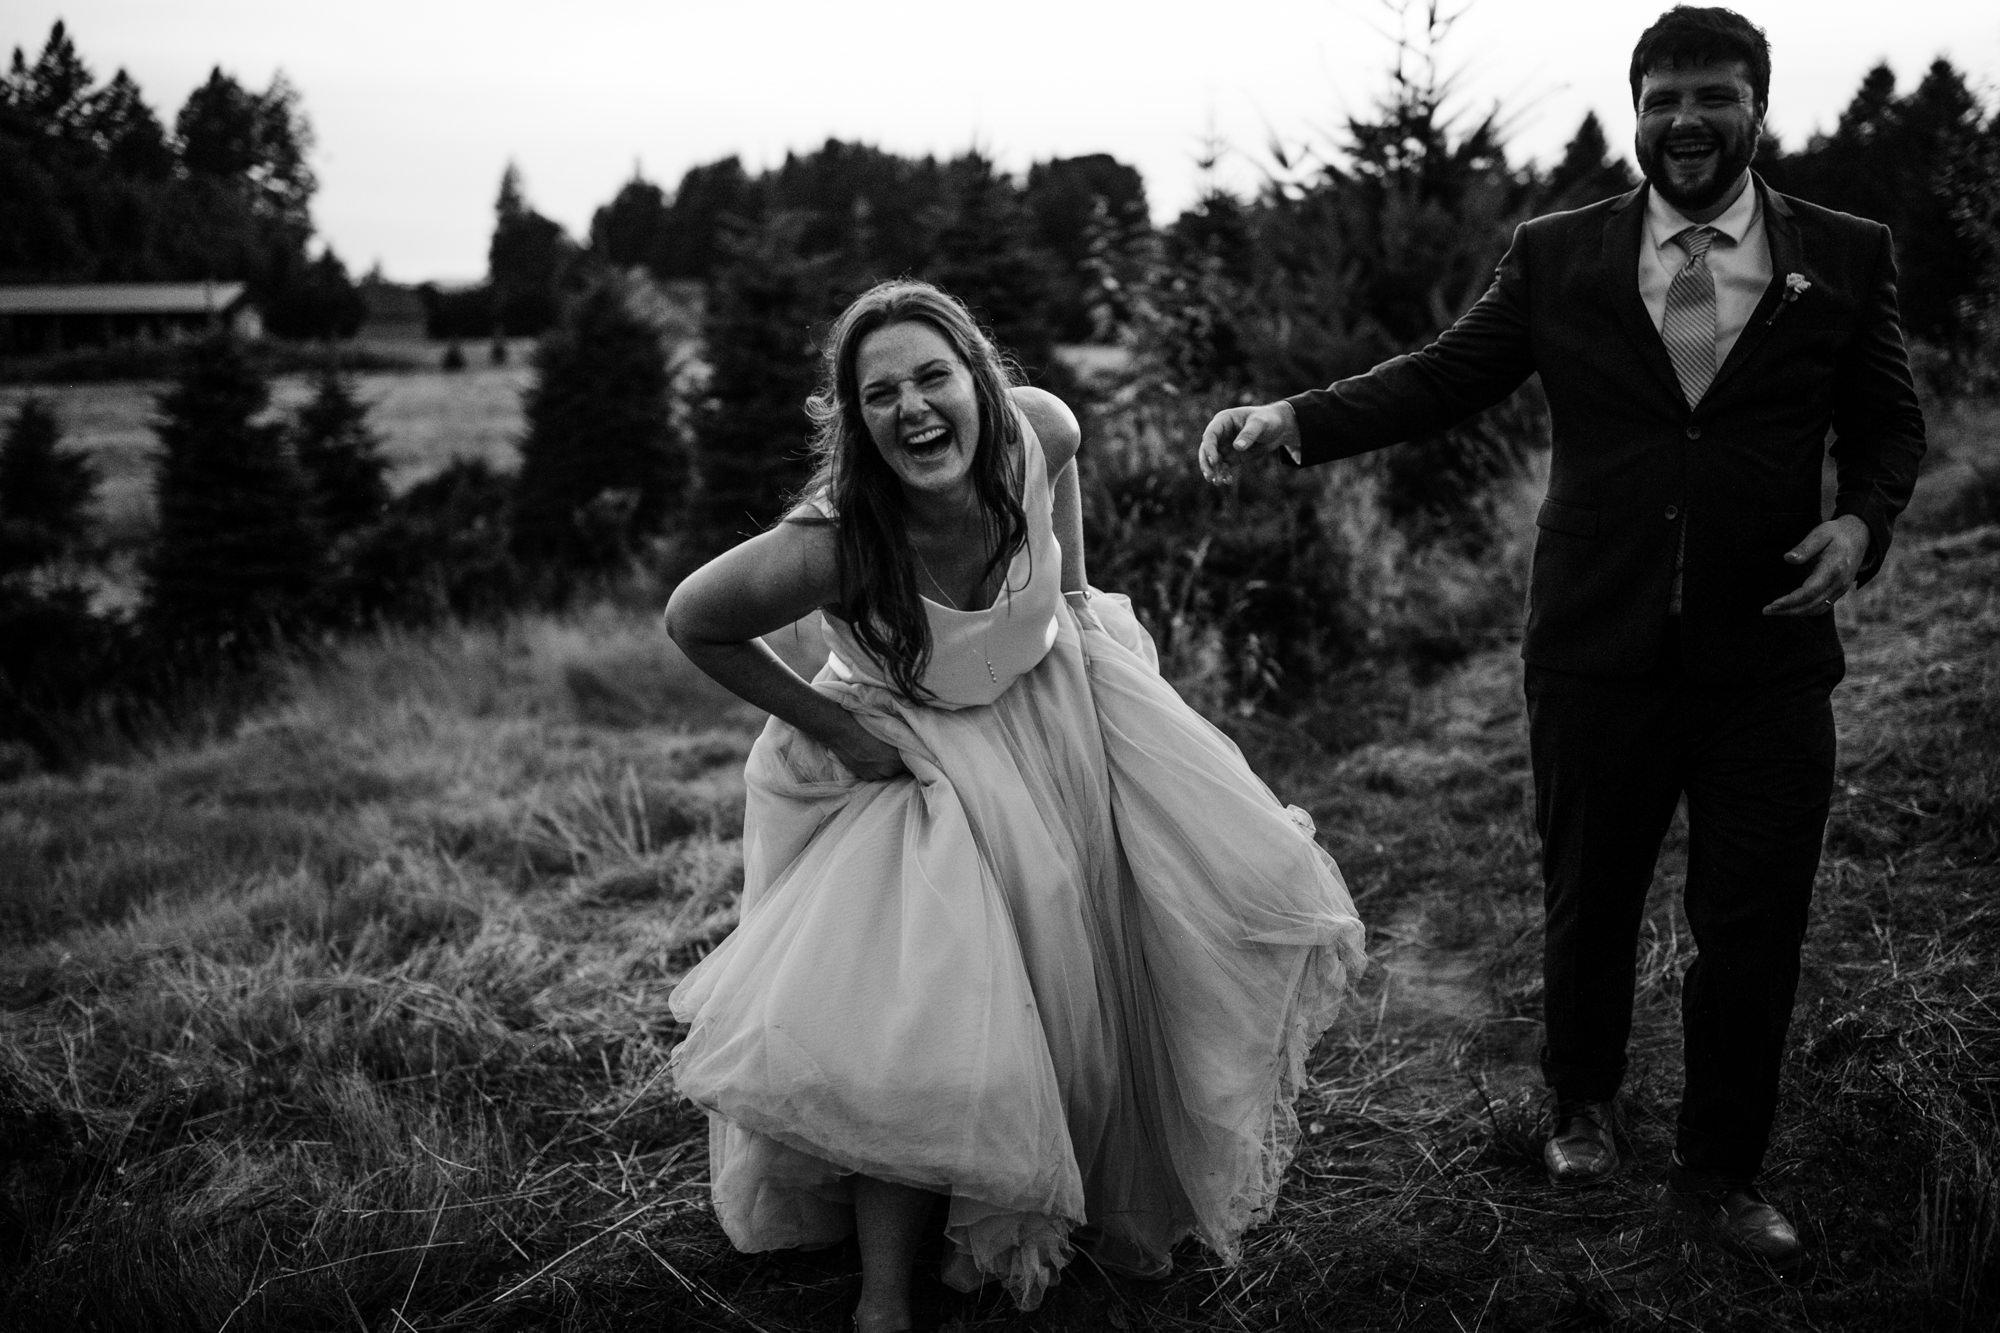 washington riverside wedding | destination adventure wedding photographers | the hearnes adventure photography | www.thehearnes.com